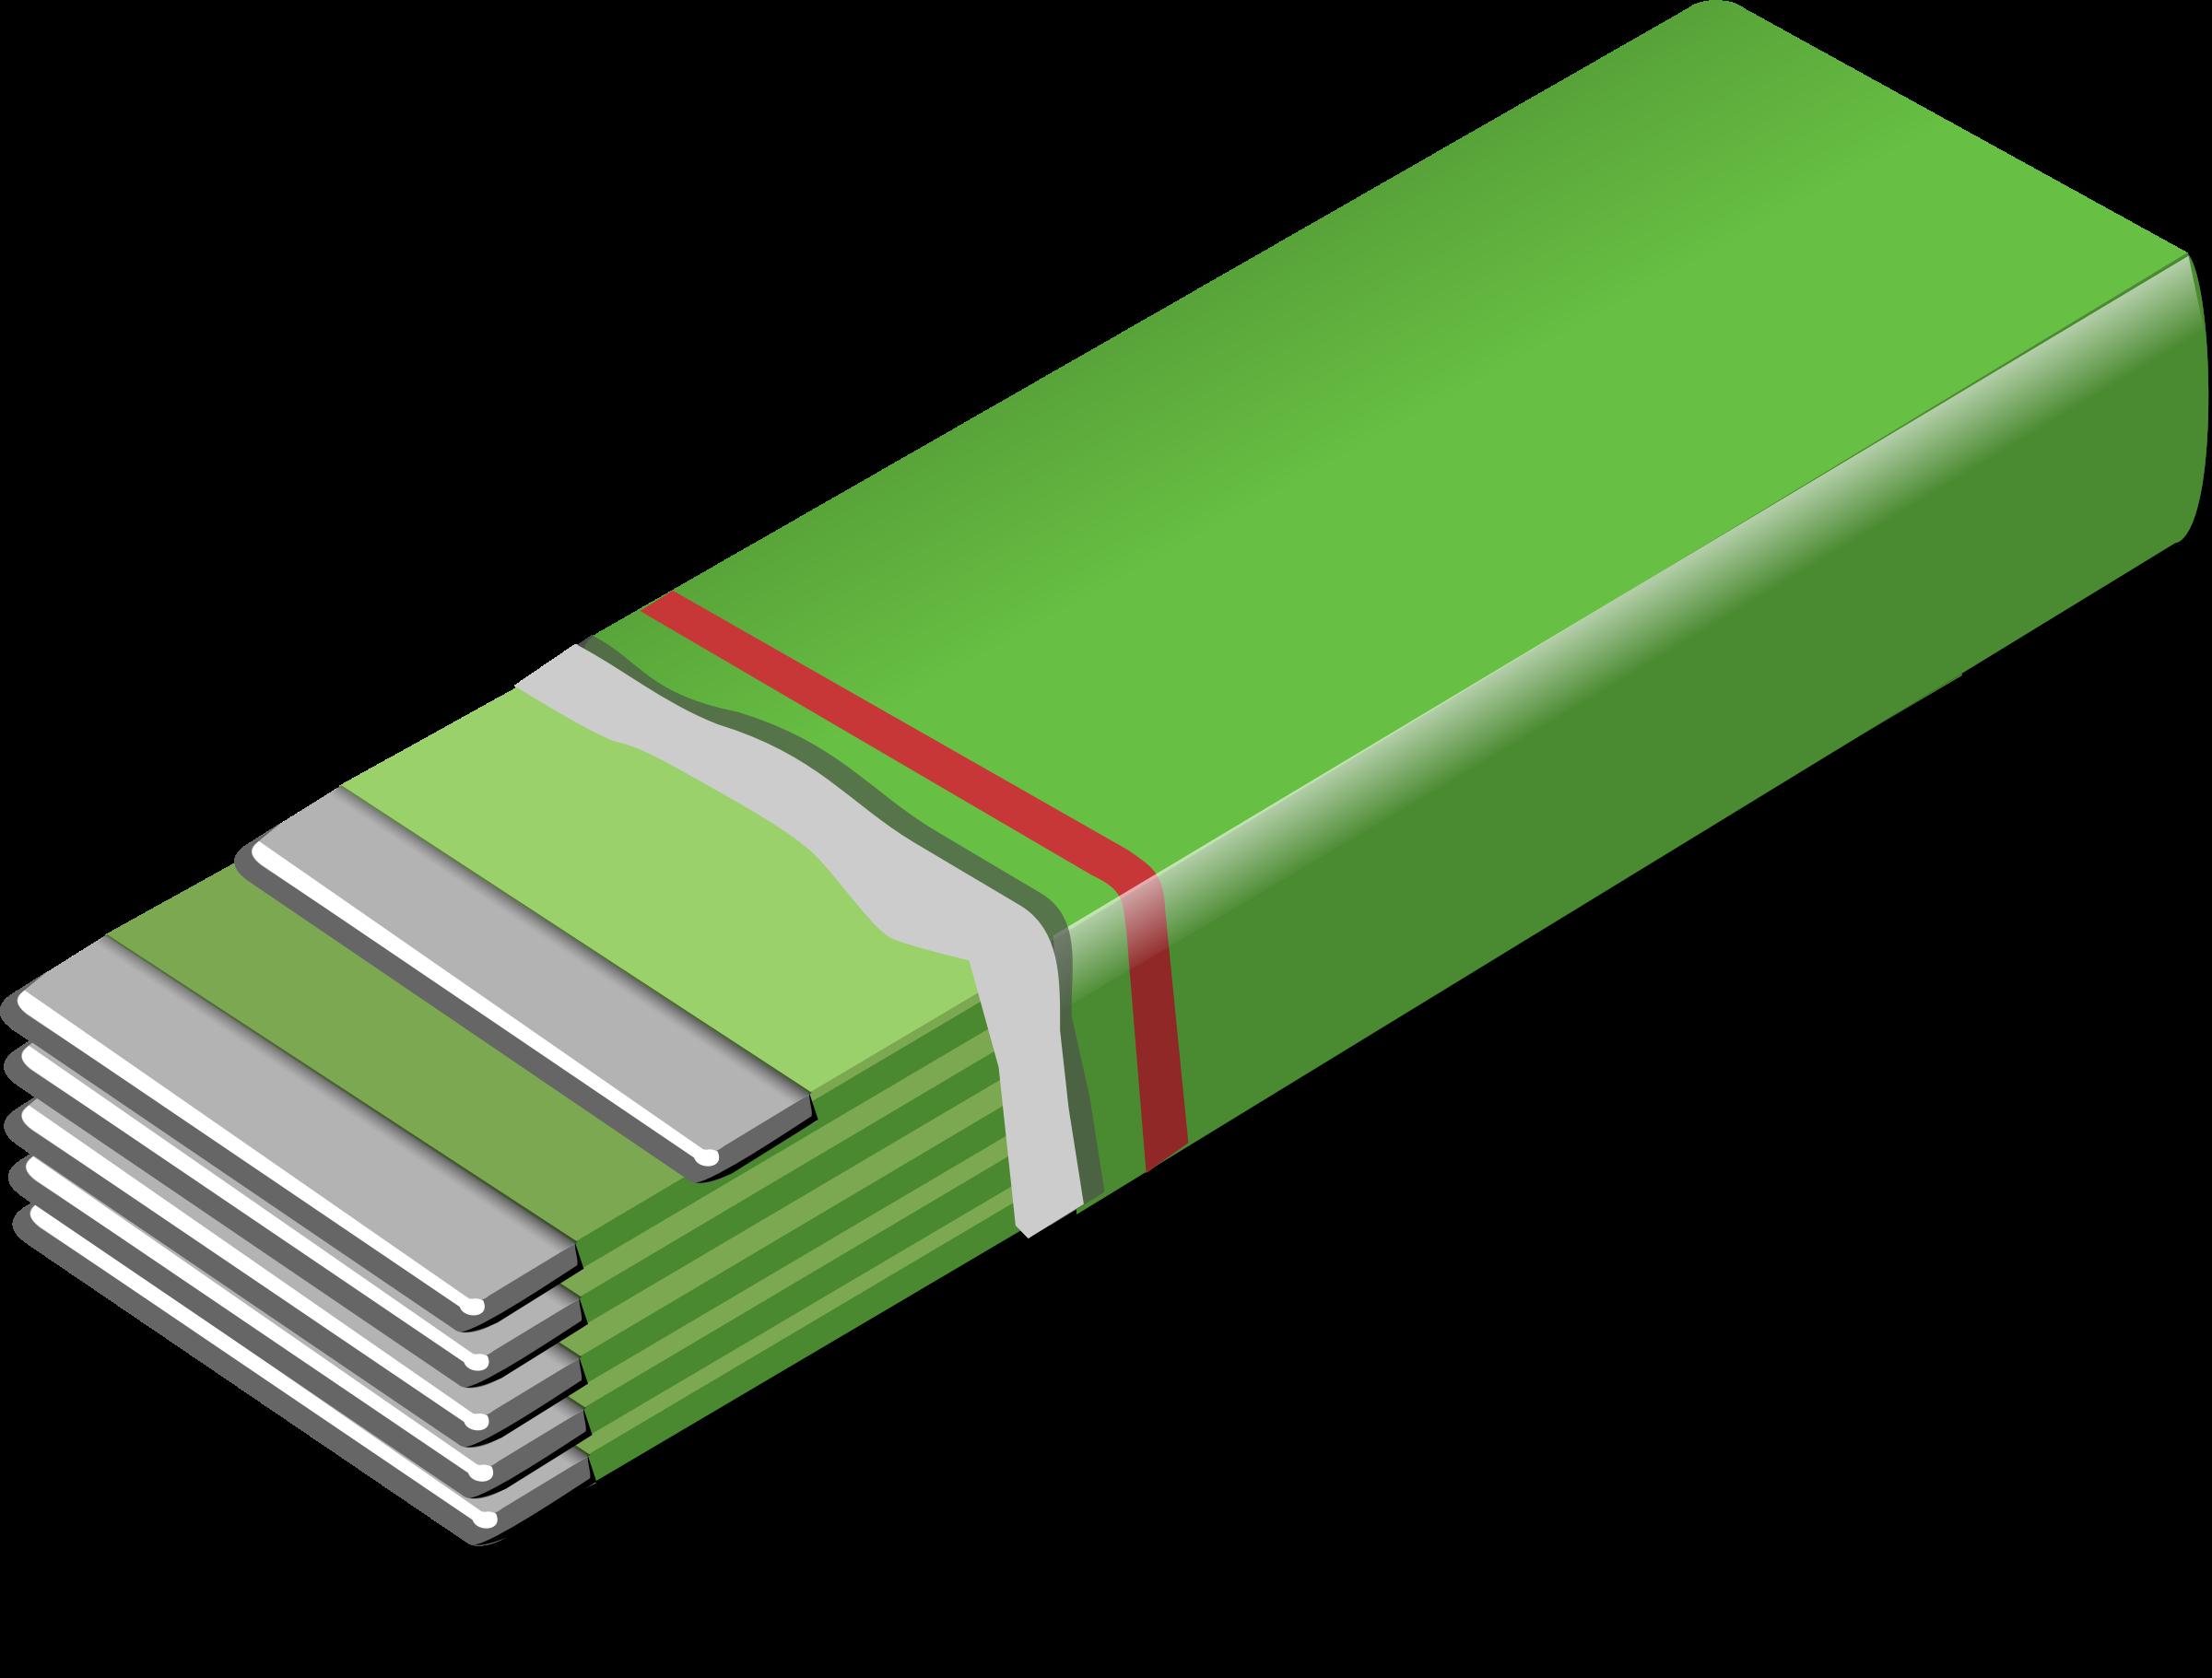 gum clipart packet